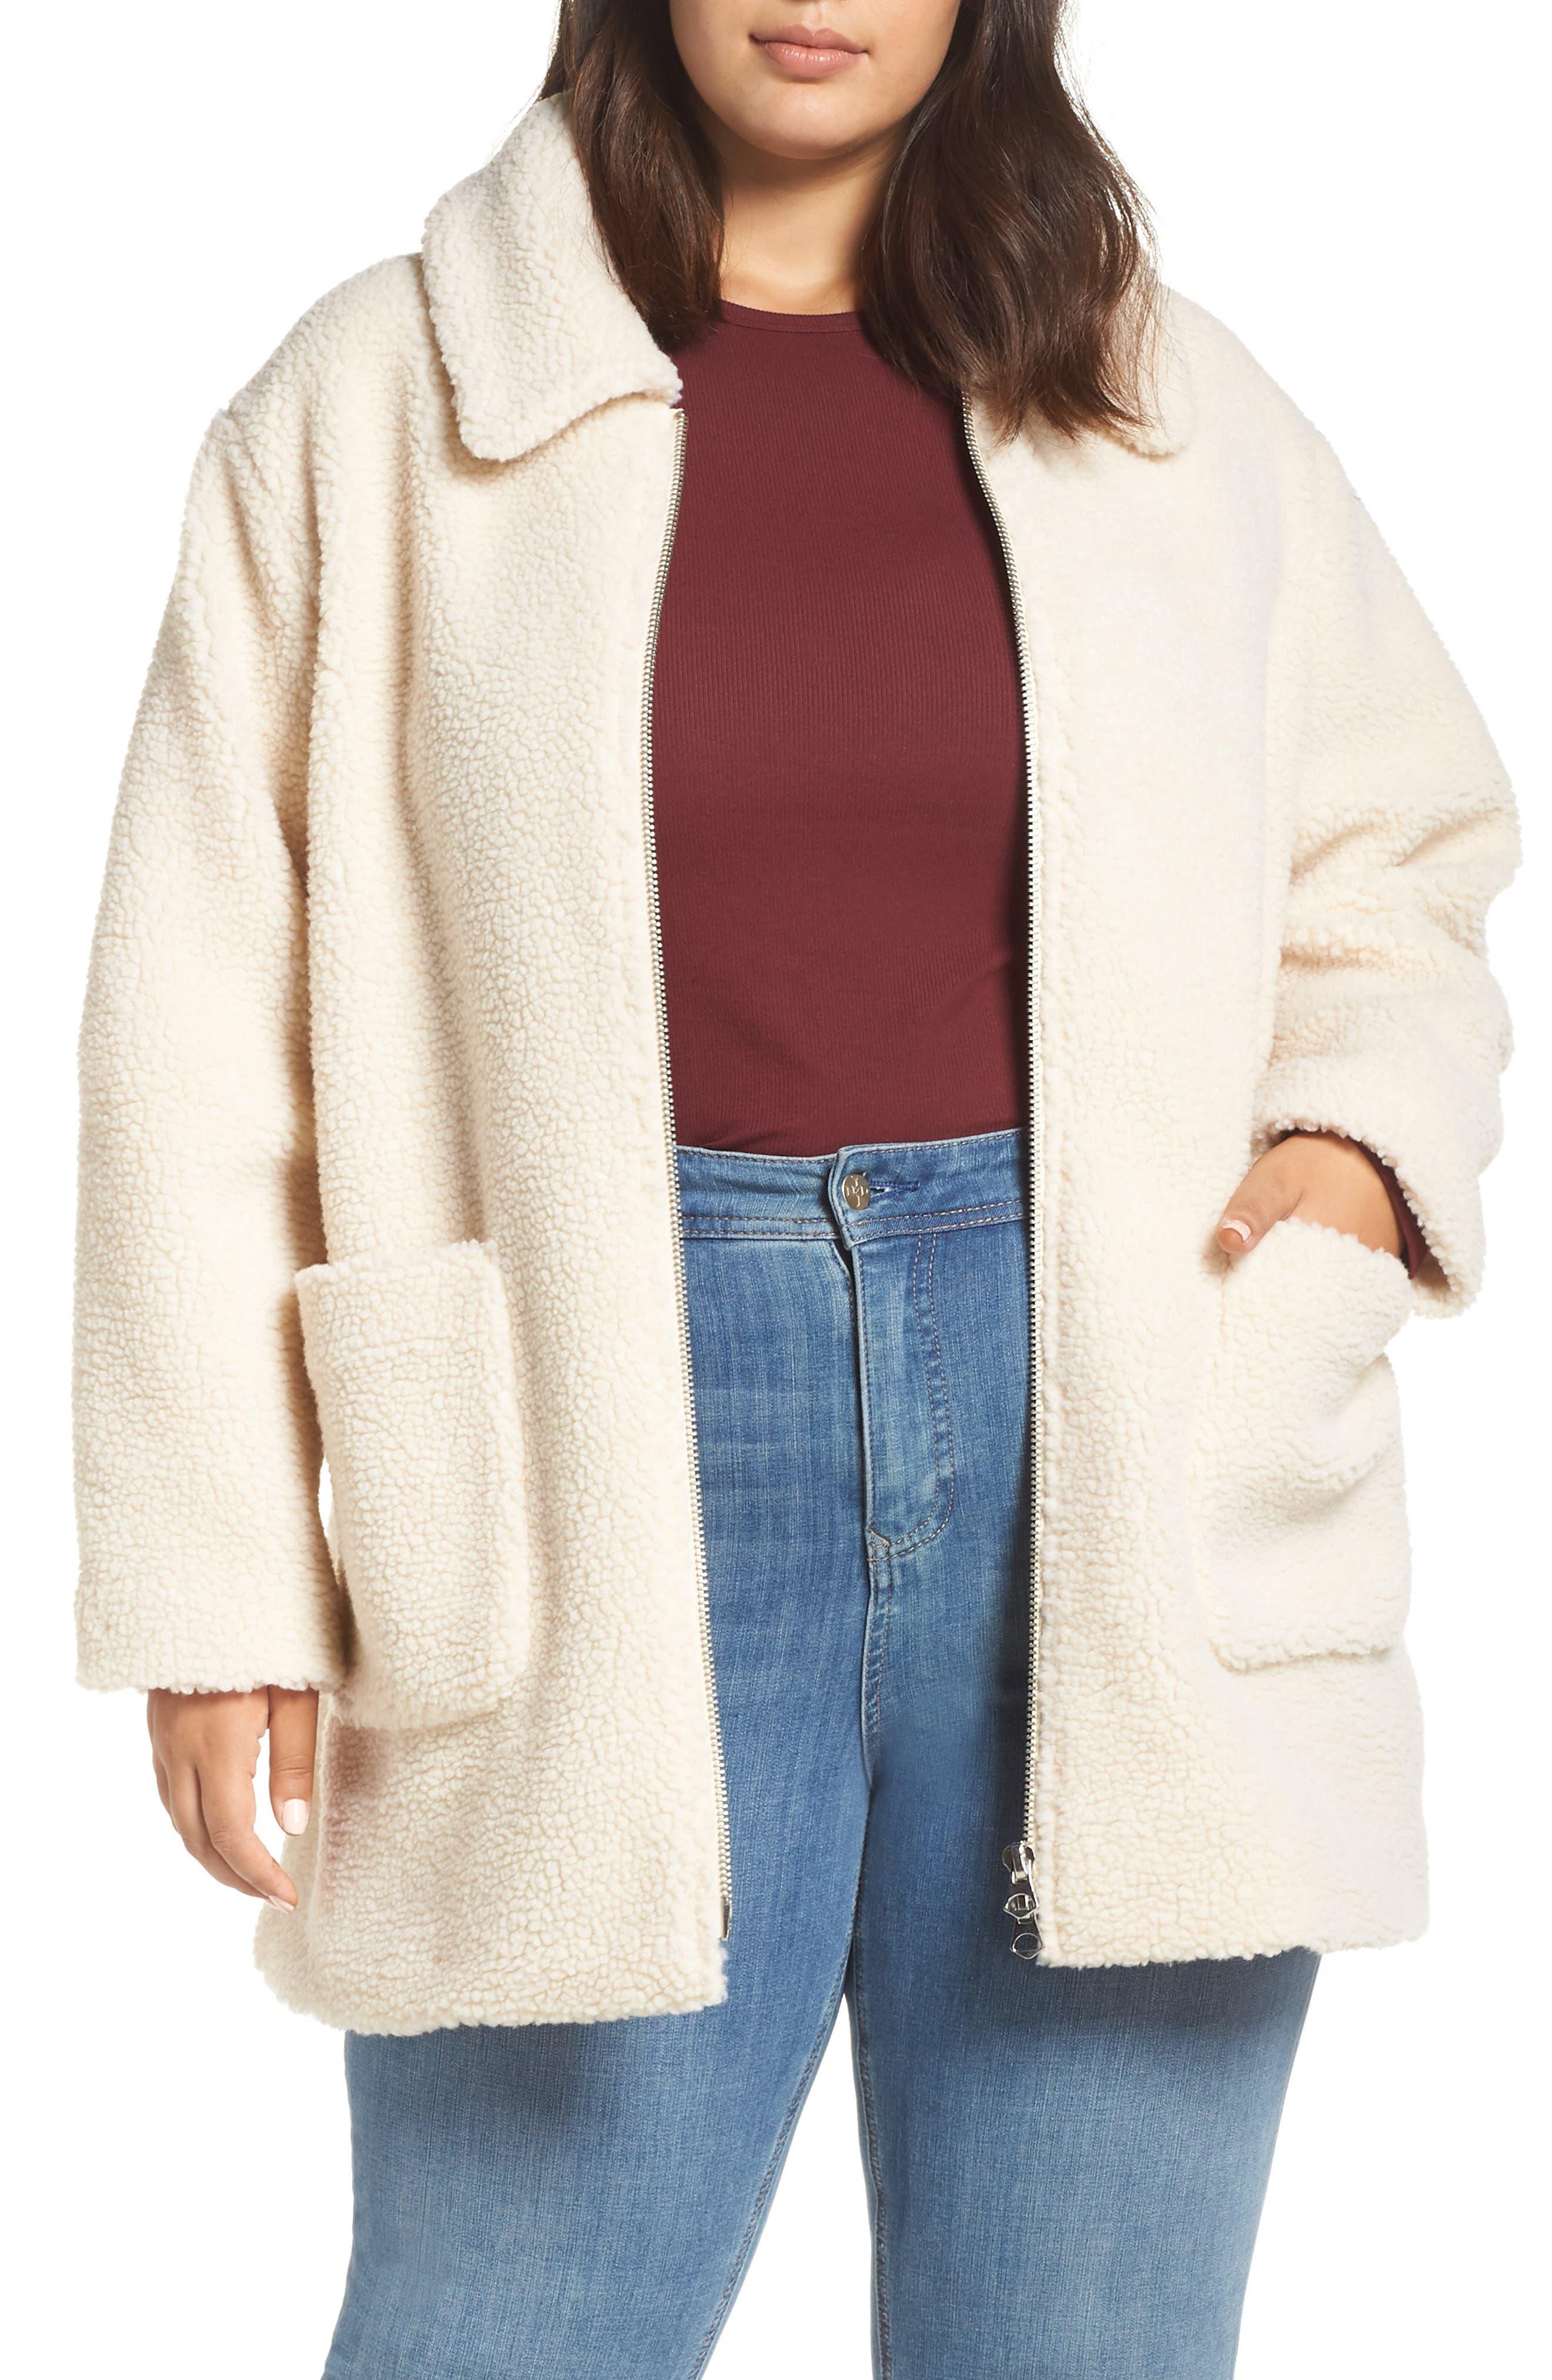 1940s Coats & Jackets Fashion History Plus Size Womens Halogen Zip Front Teddy Coat $149.00 AT vintagedancer.com